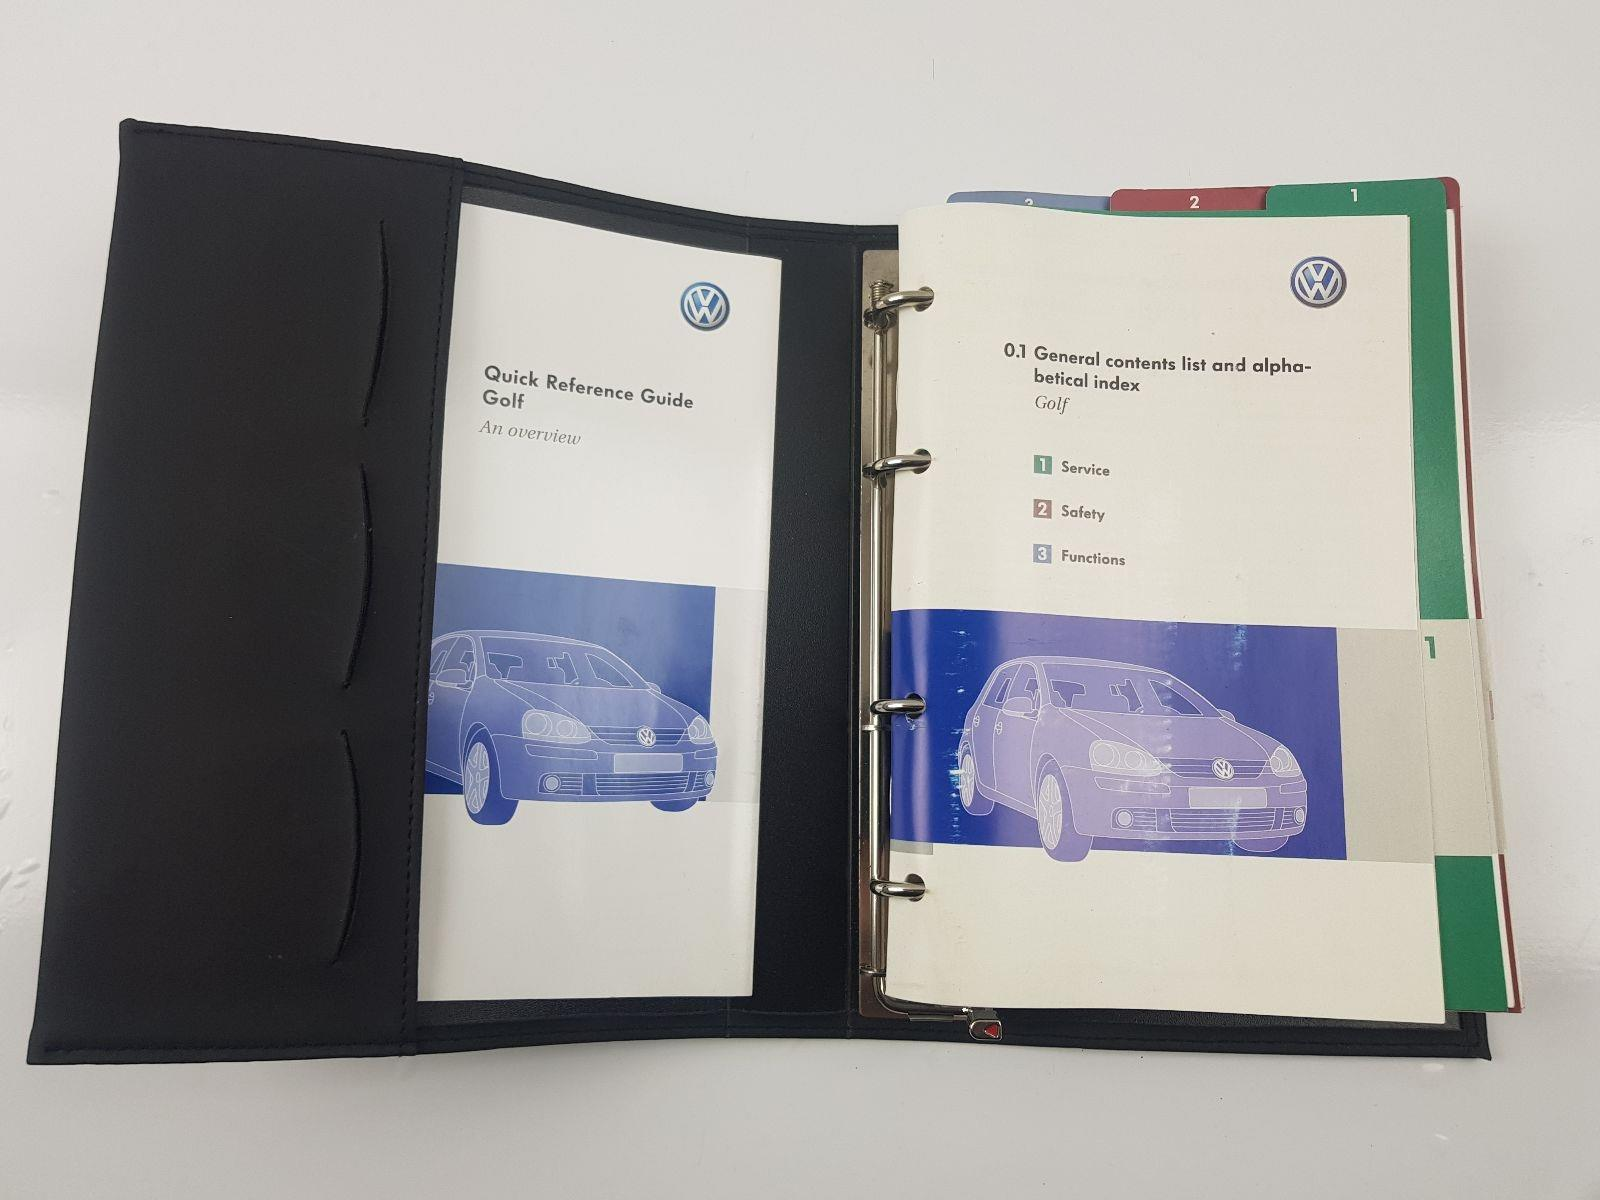 volkswagen golf mk5 2003 to 2009 book pack diesel manual for rh scbvehicledismantlers co uk Volkswagen Golf TDI Manual Volkswagen Golf GTI